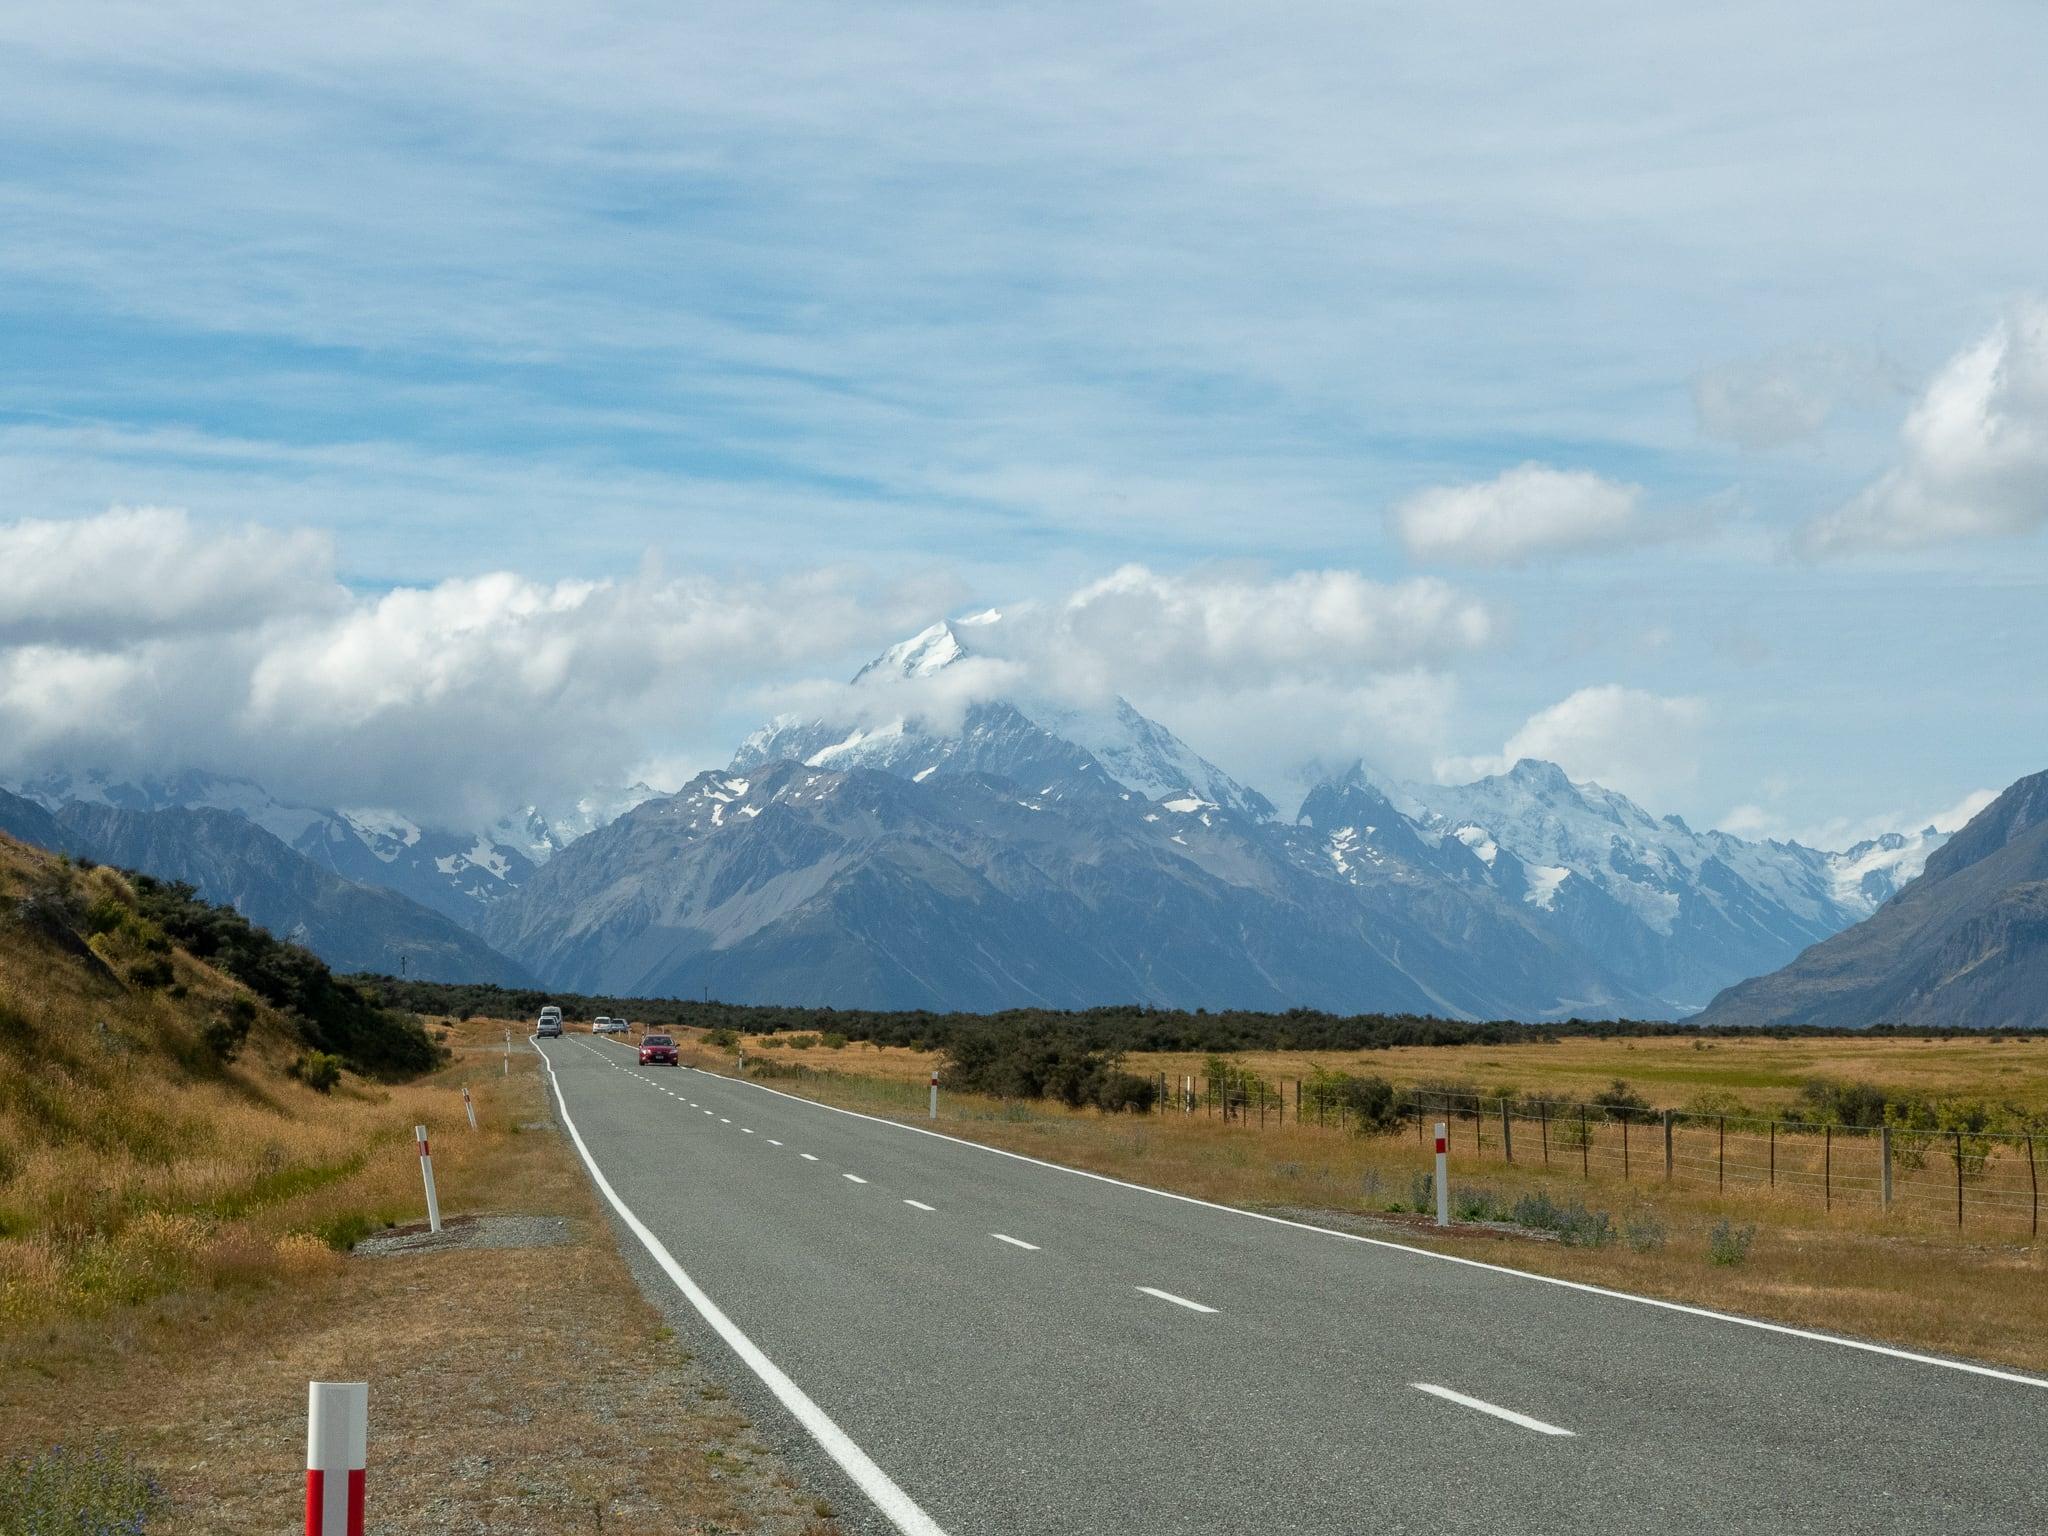 664: Mount Cook